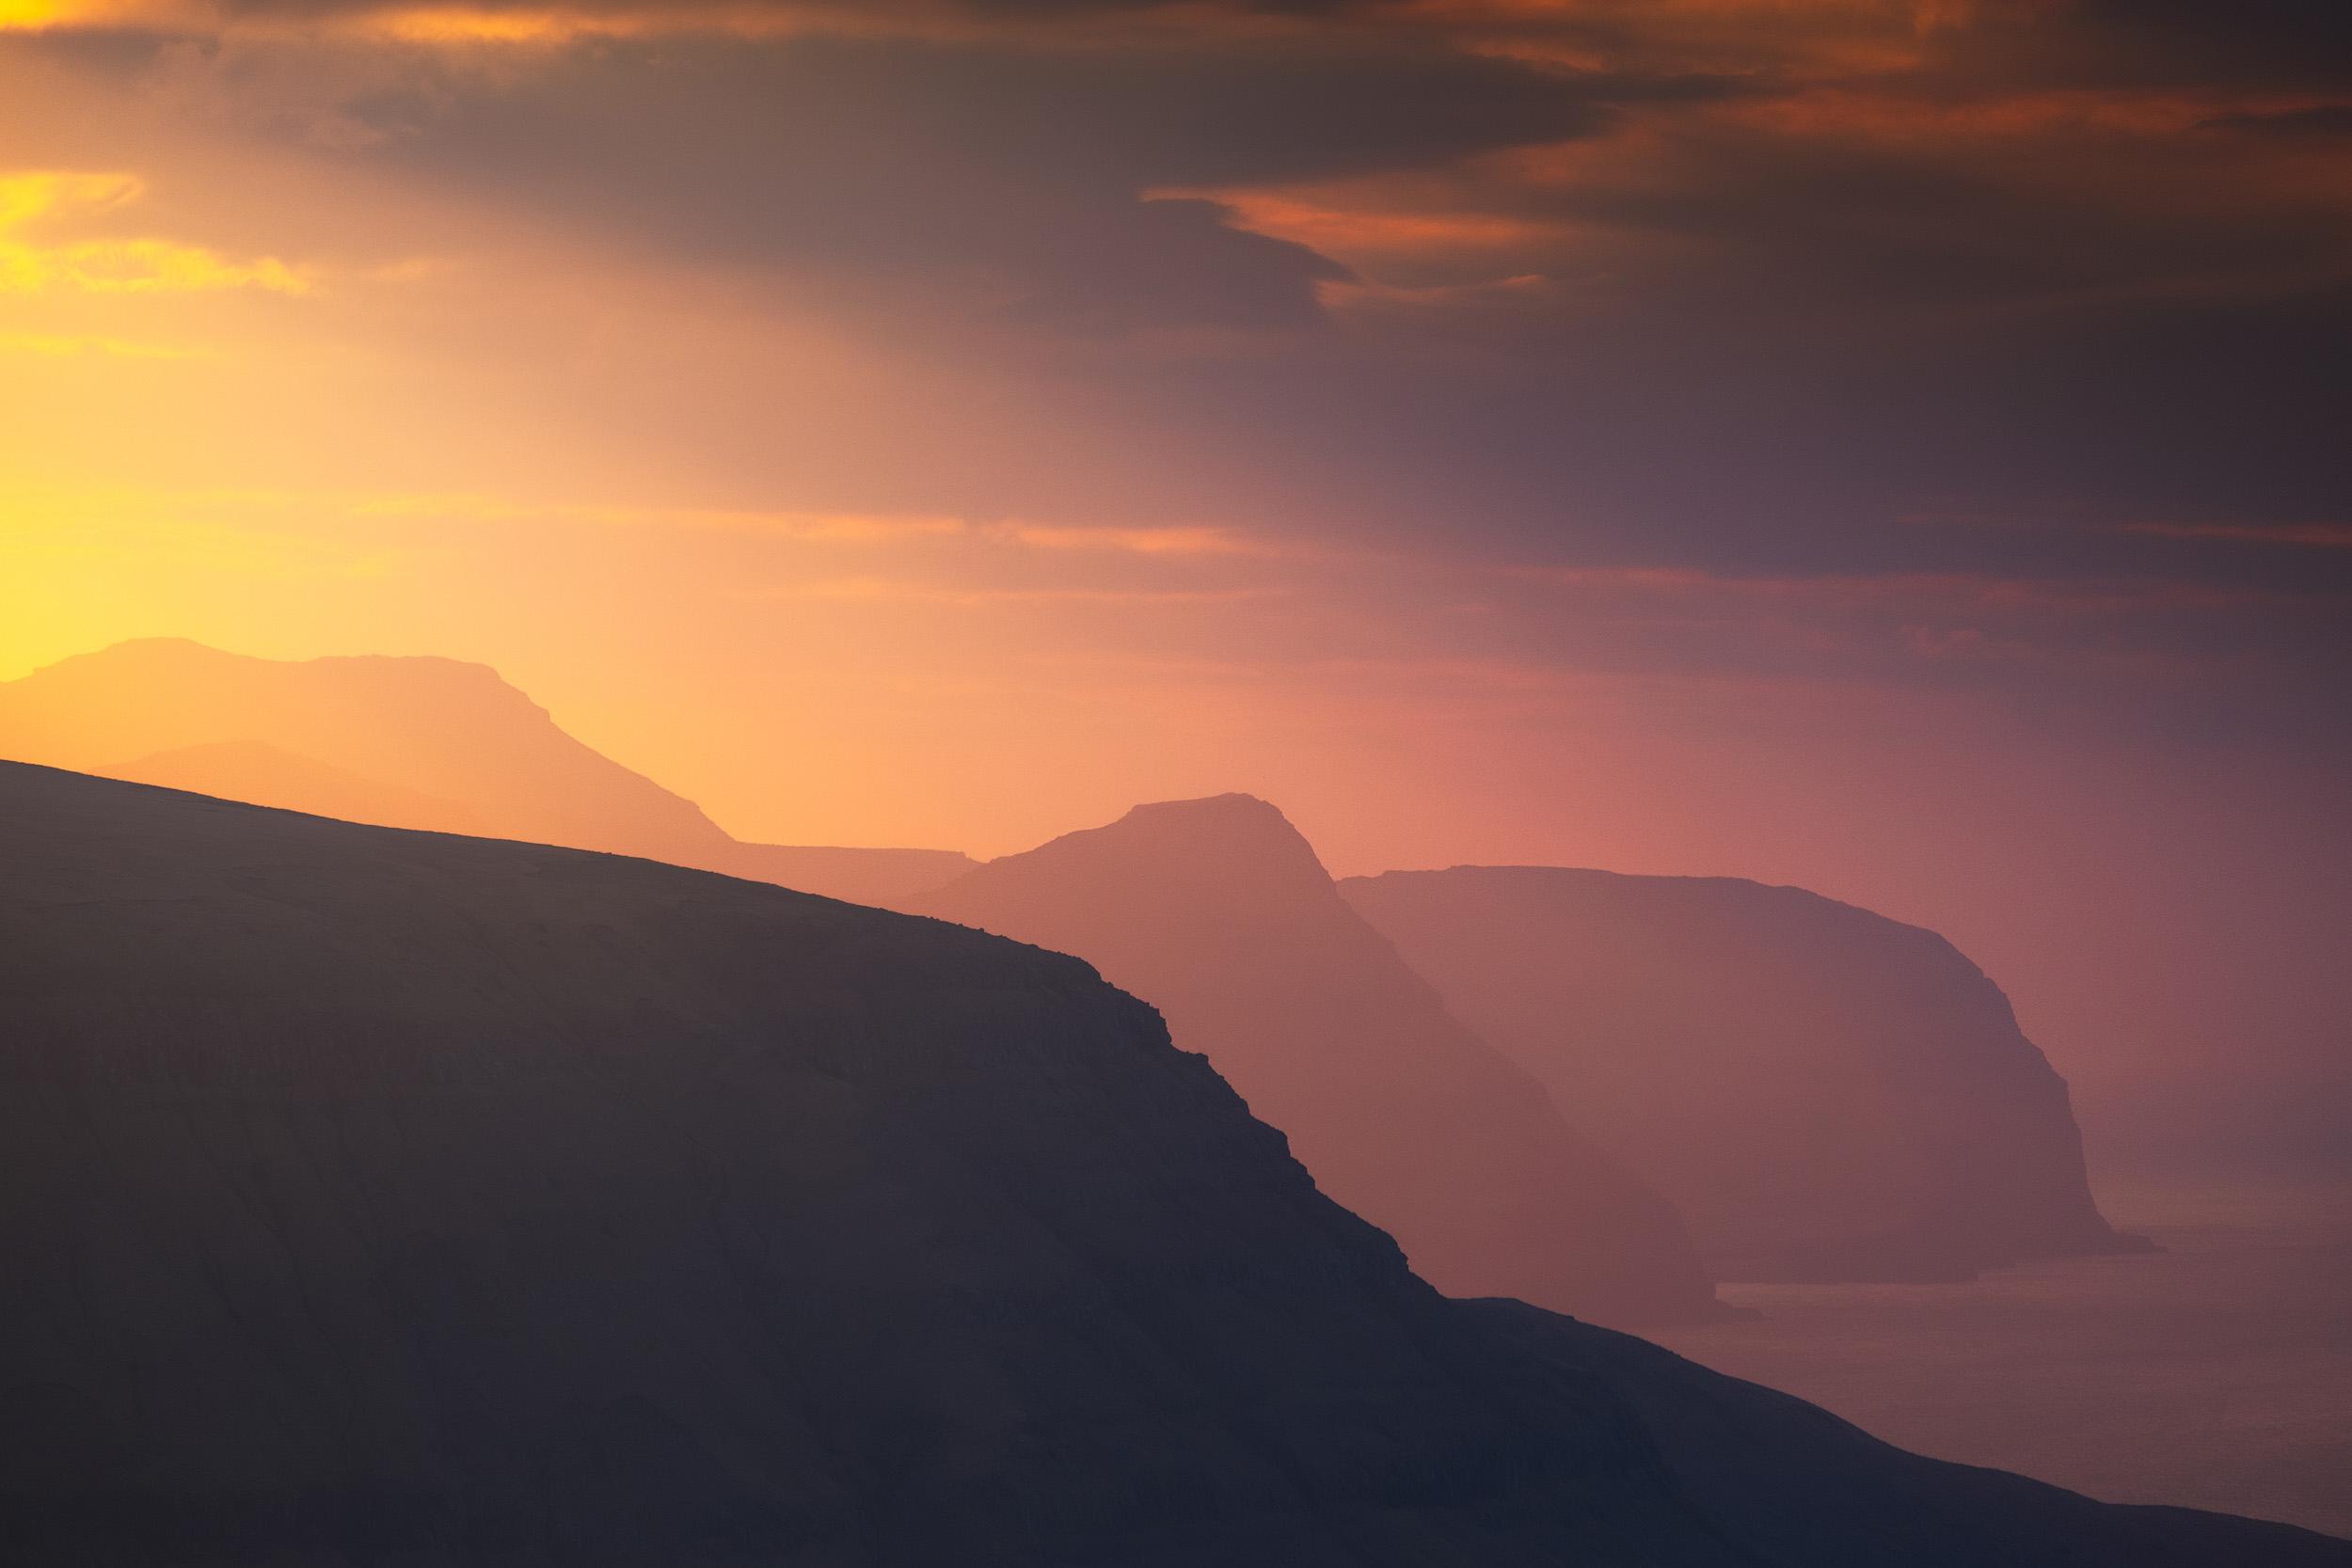 Klakkur Sunset   The last light of day above the Faroe Islands from the peak of Klakkur on Bordoy.